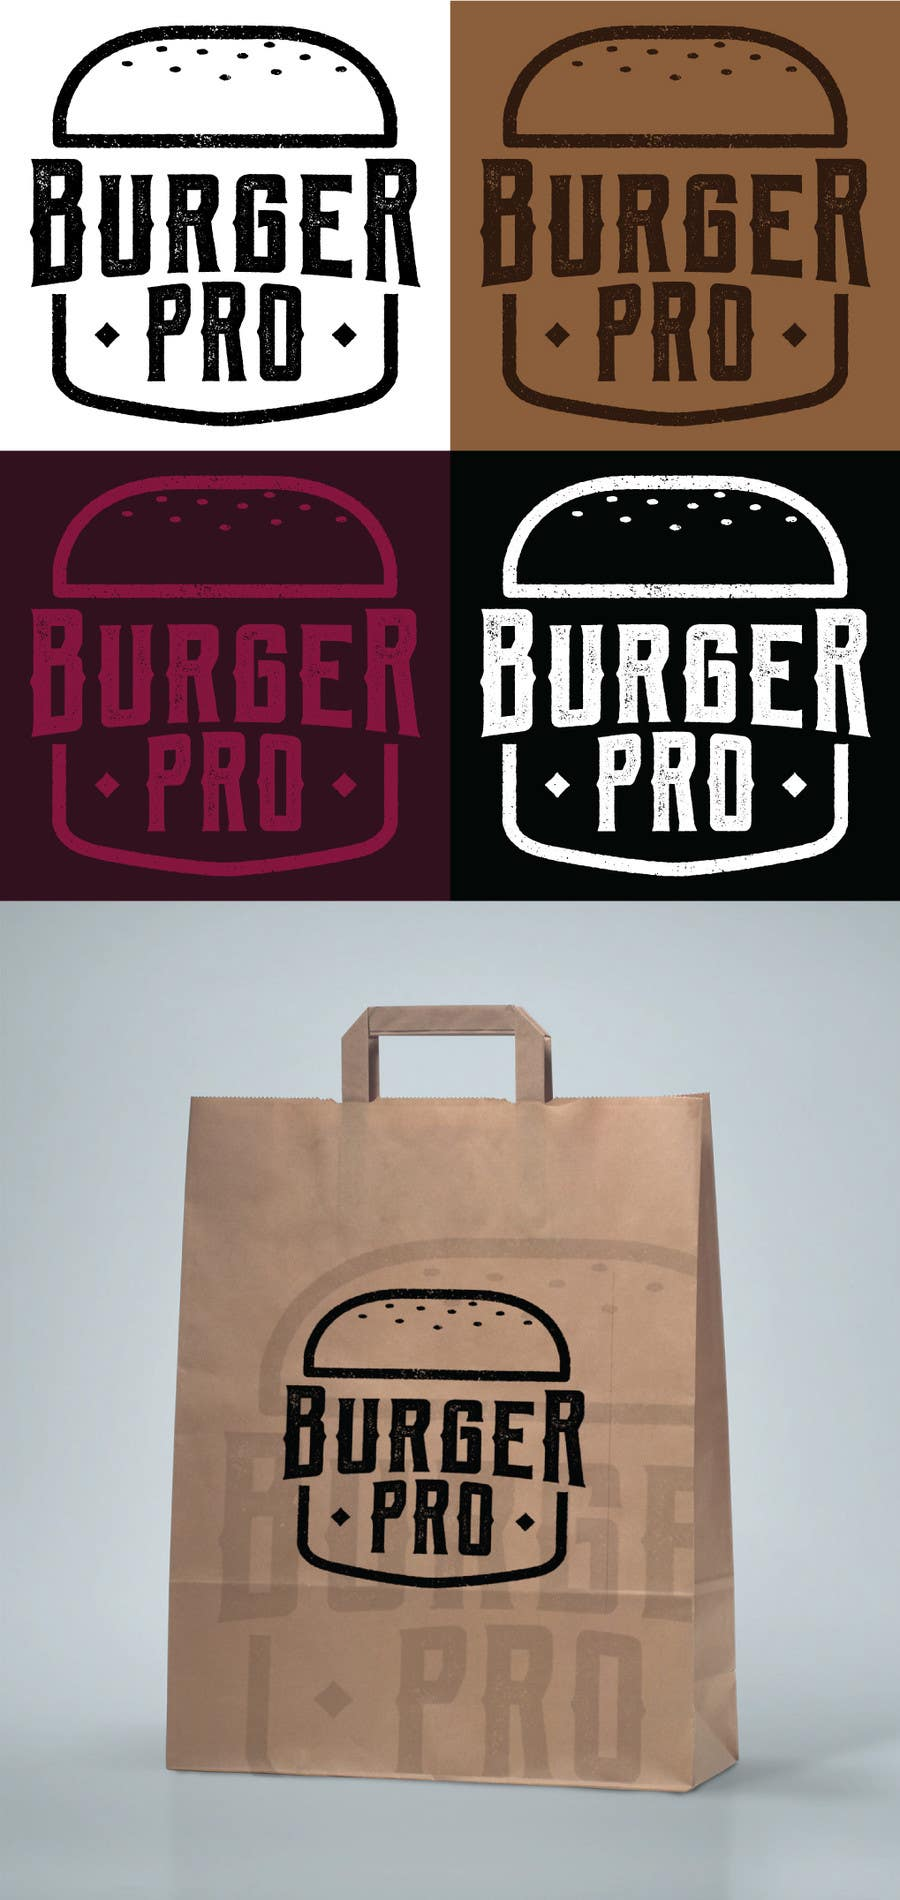 Proposition n°86 du concours Design two Logos for a Burger restaurant